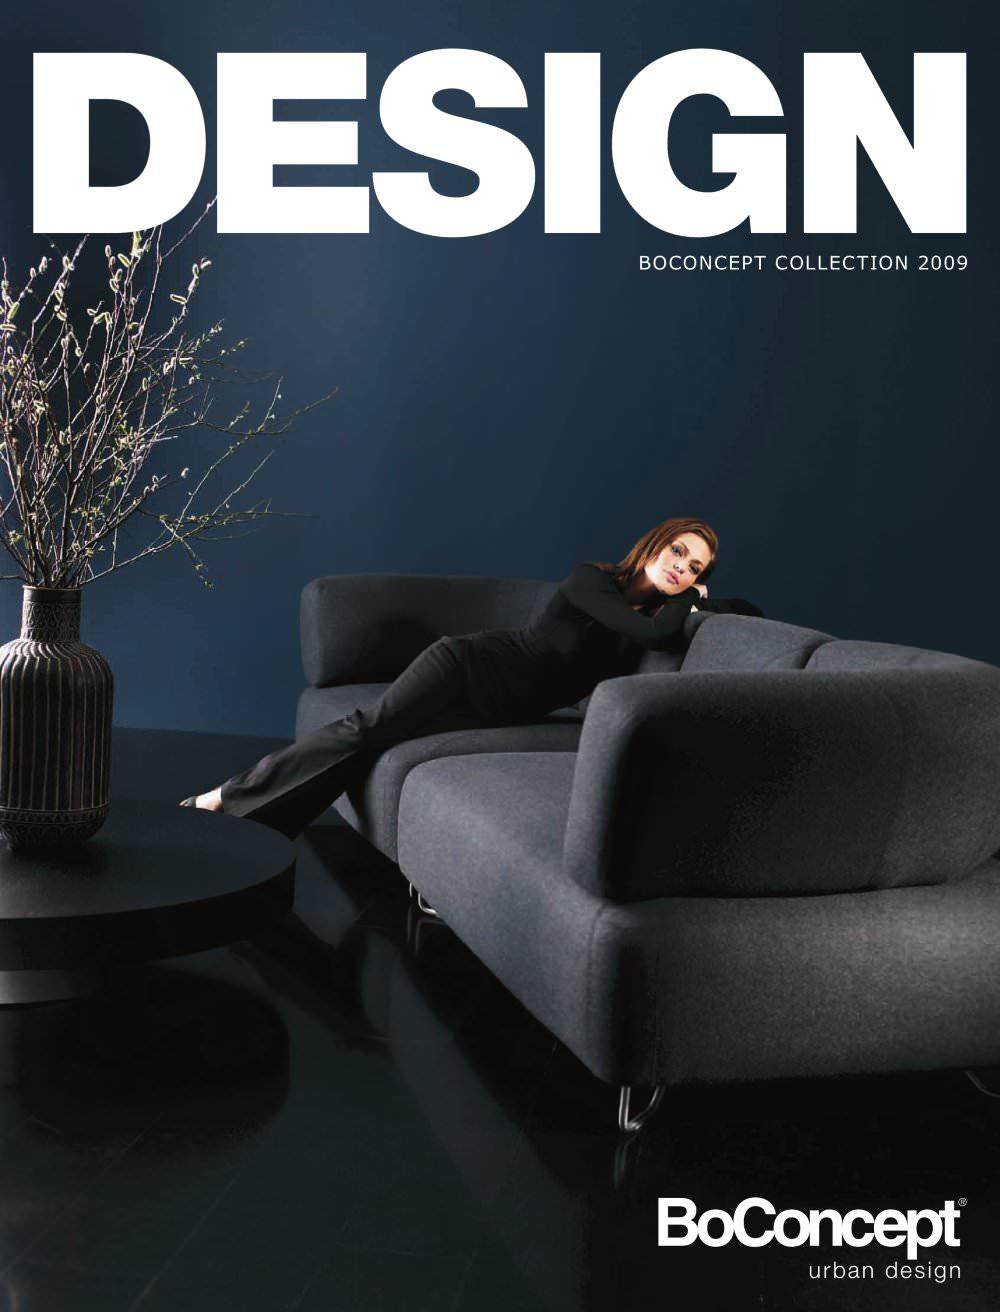 Design Boconcept Collection 2009 1 196 Pages